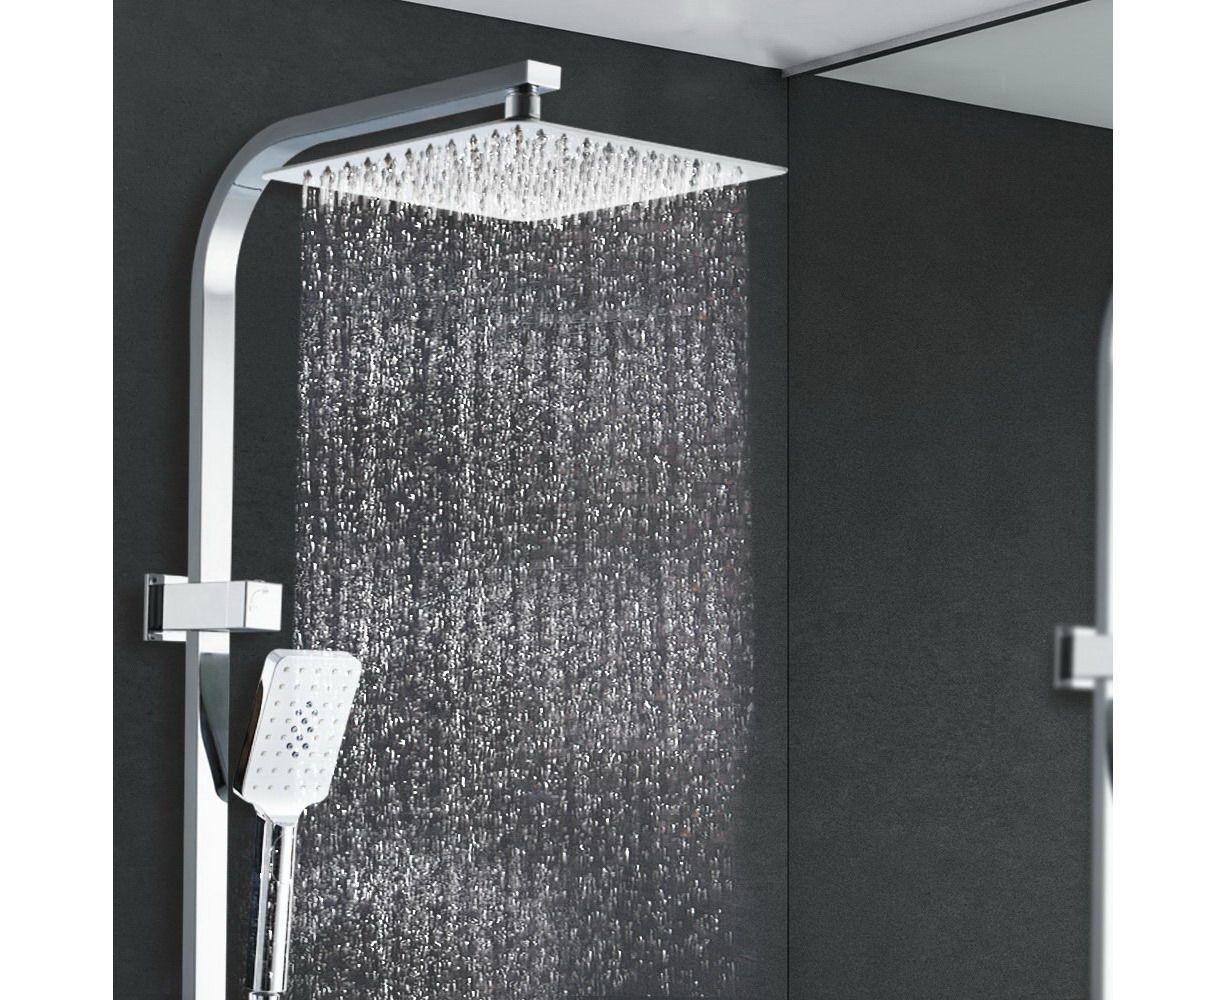 Cefito 10 Rain Shower Head Set Square Dual Heads Faucet High